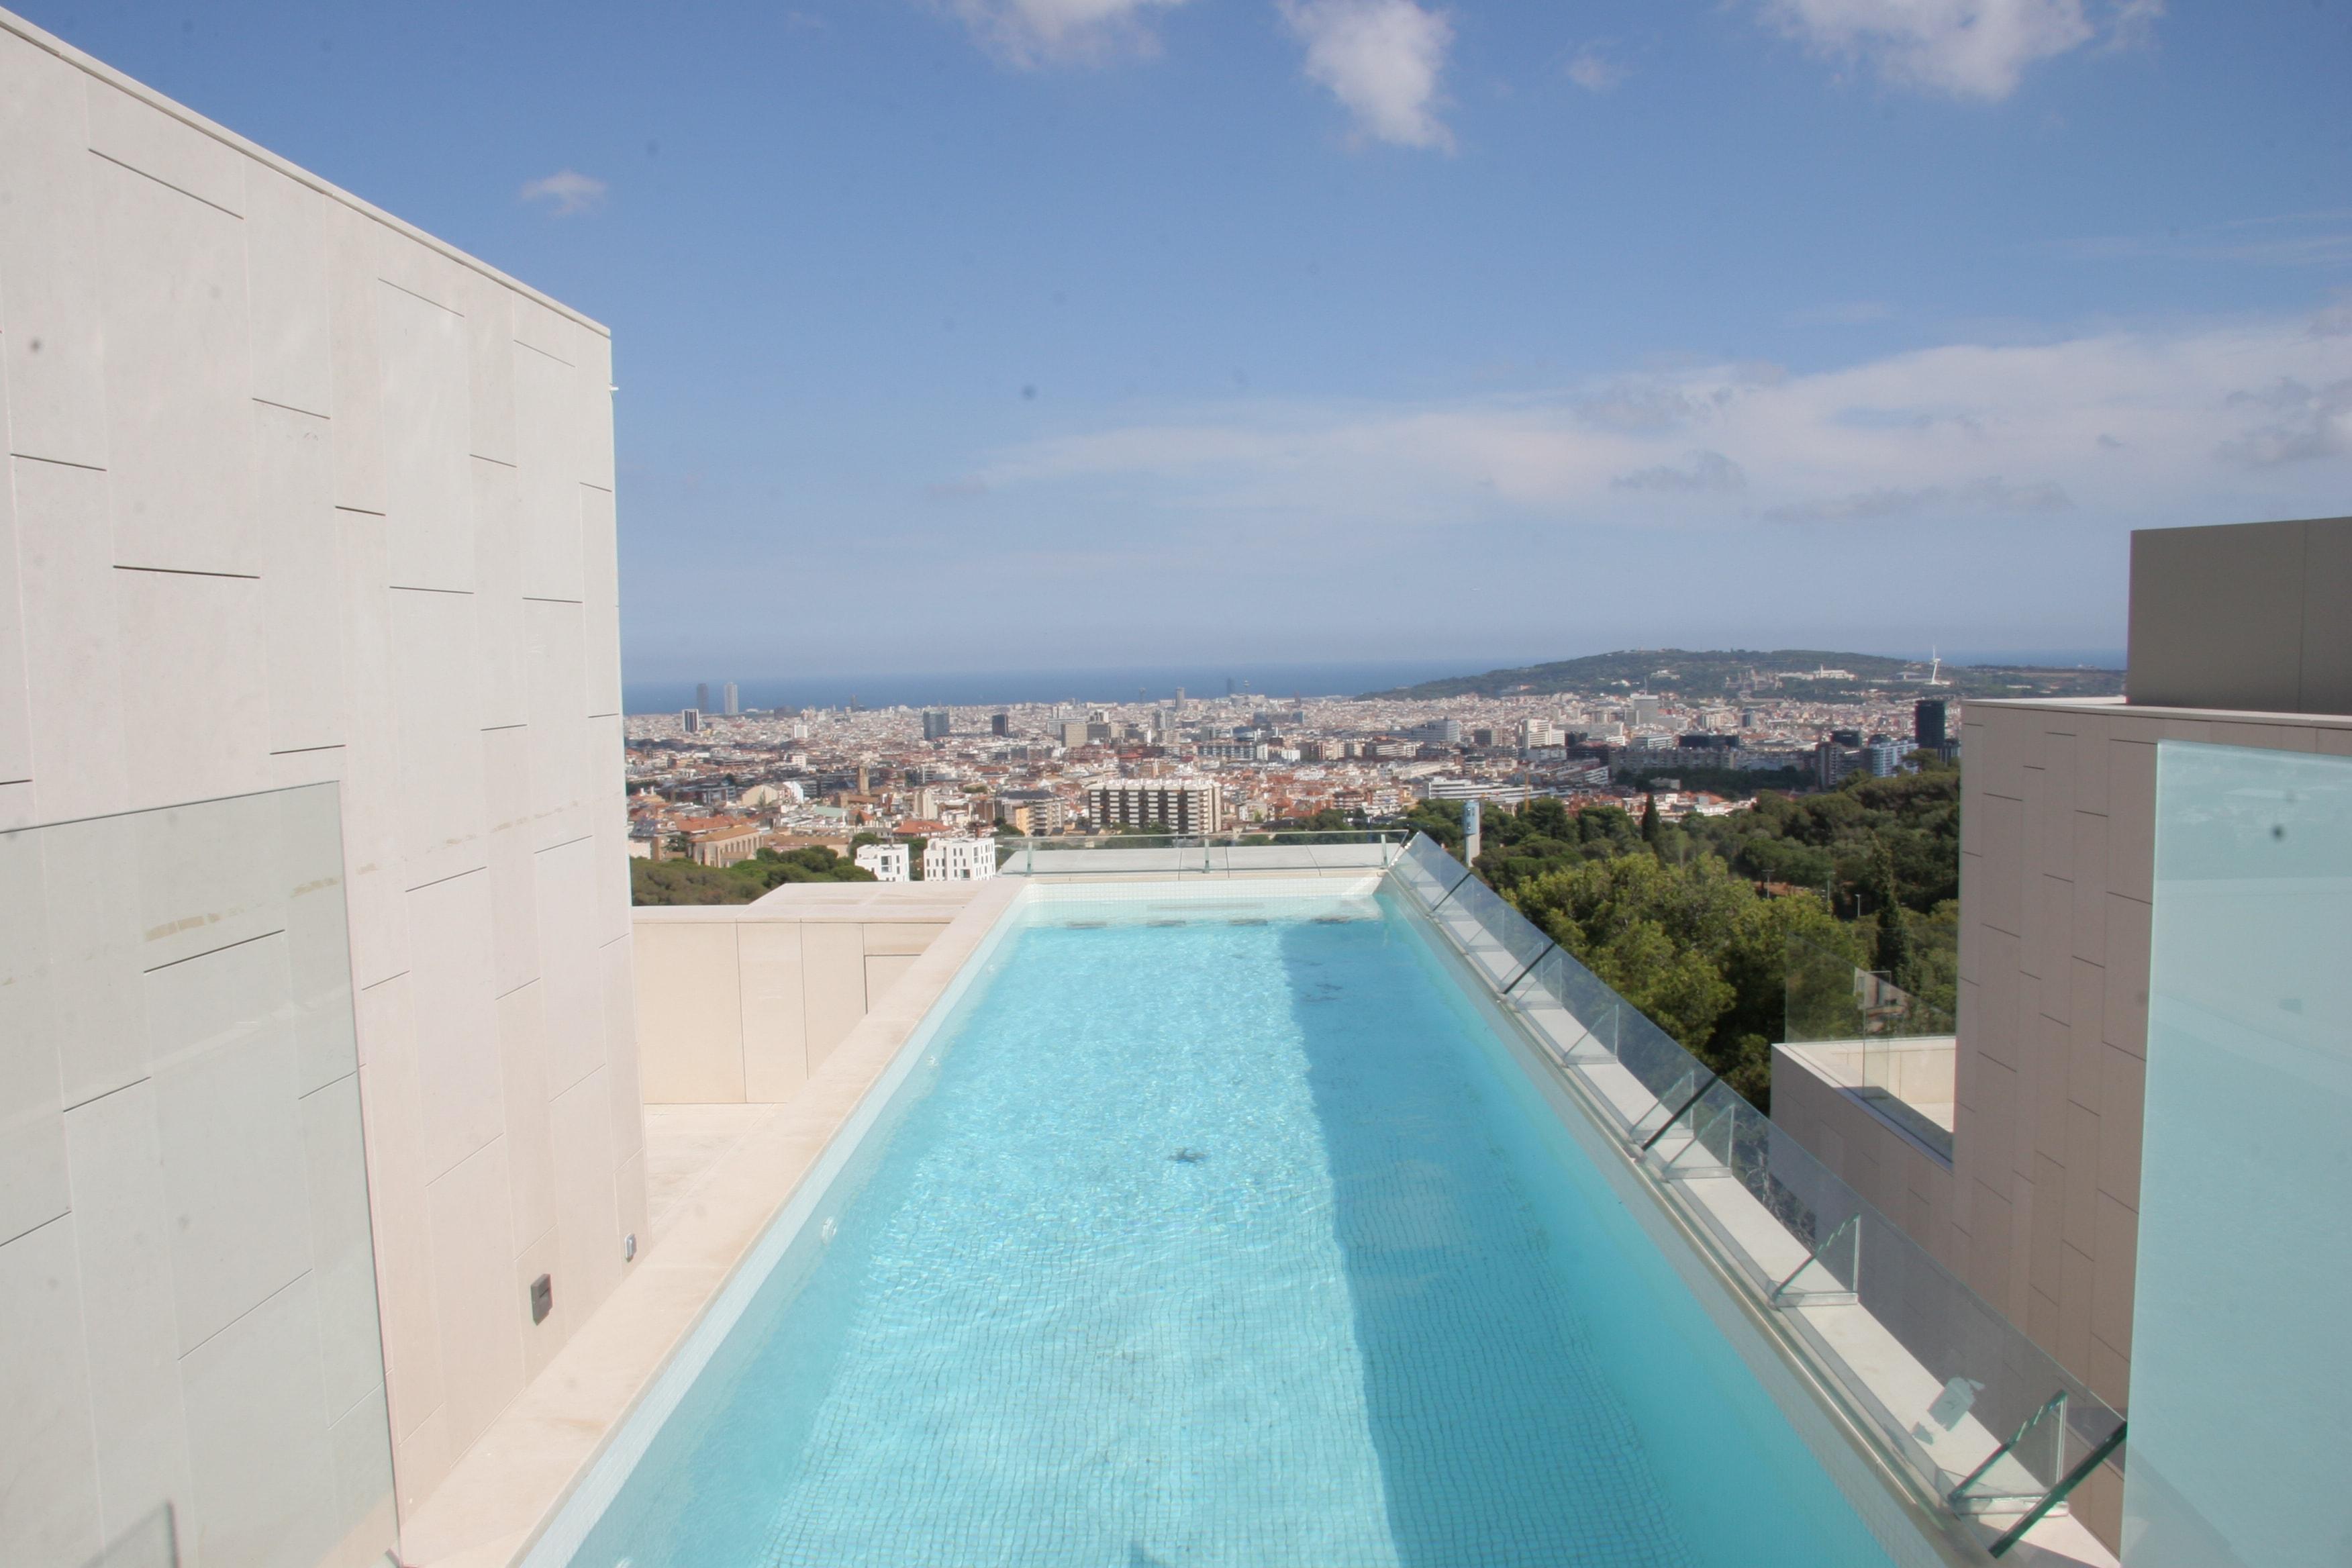 casa amb piscina Can Caralleu